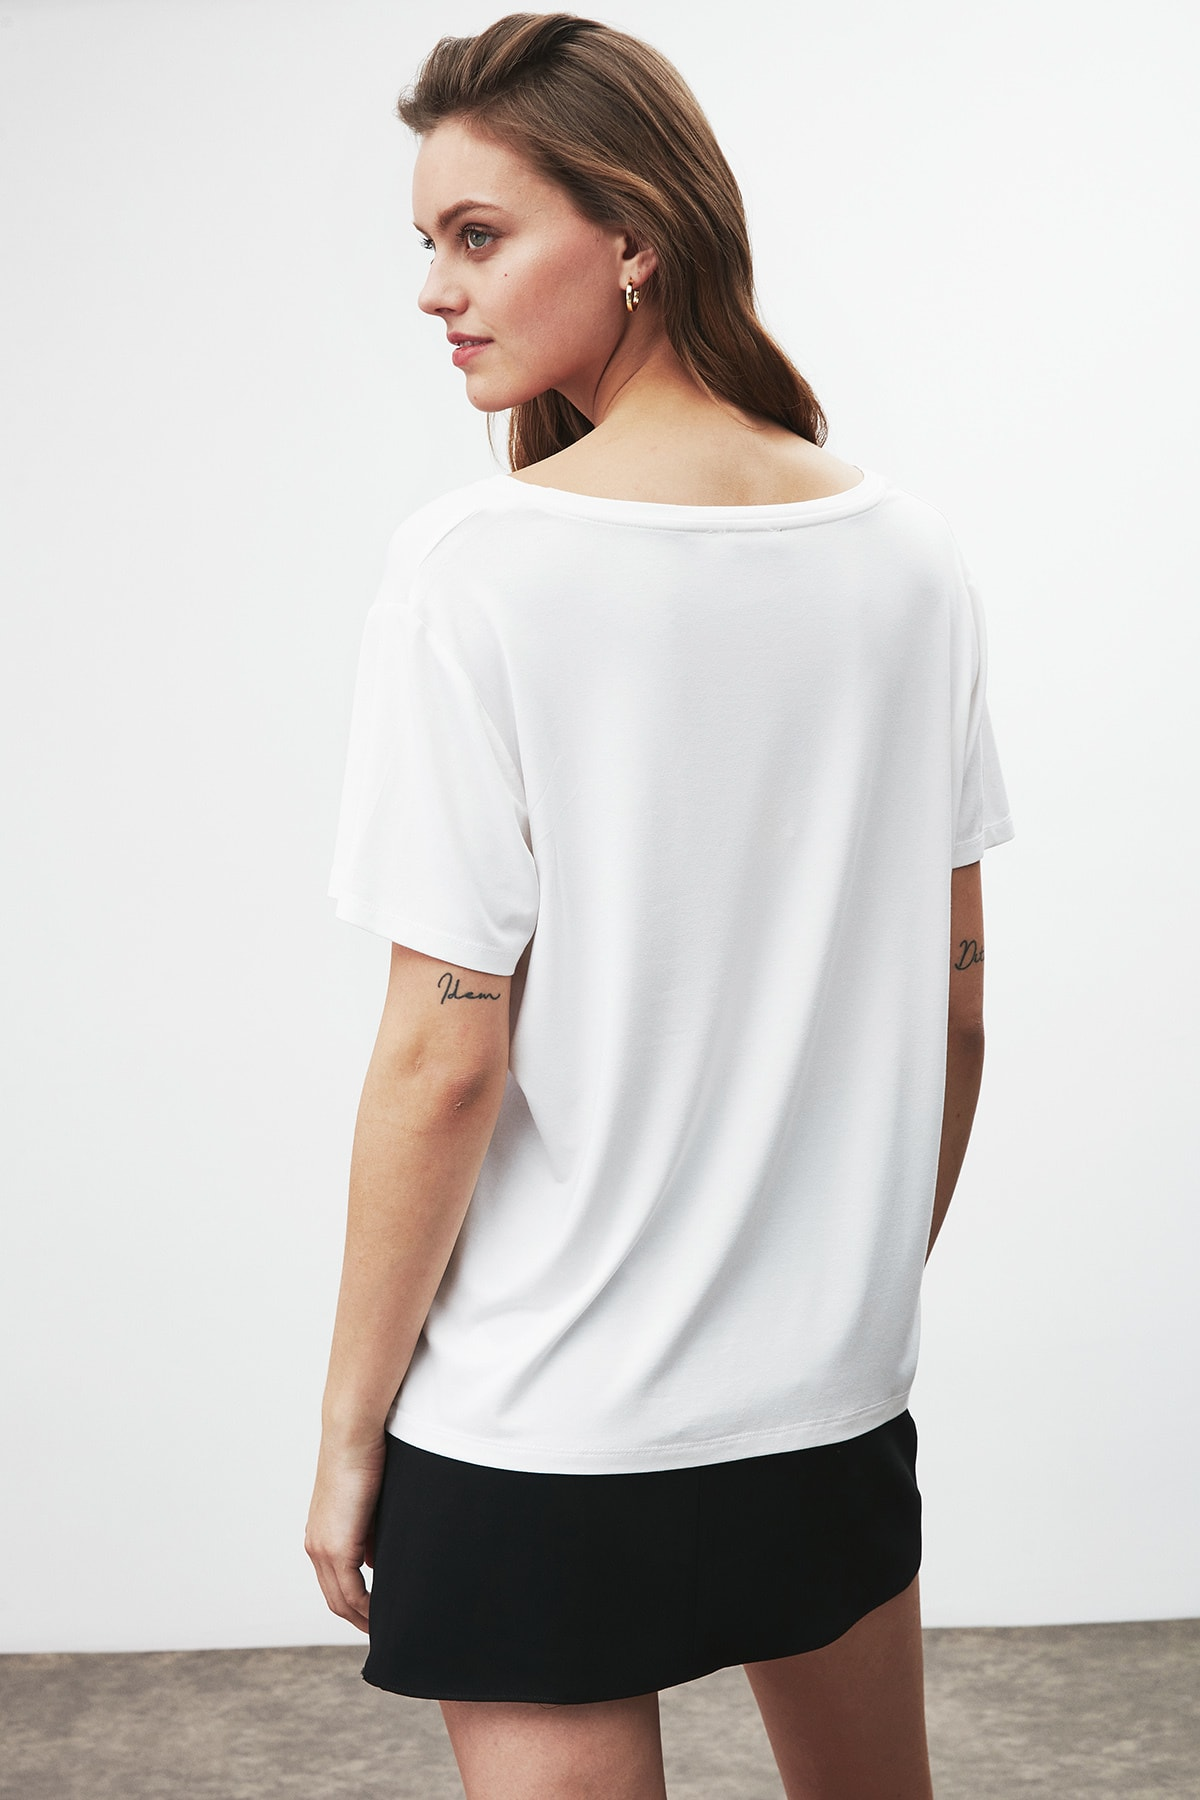 GRIMELANGE Vıolet Kadın Beyaz Comfort Fit V Yaka Kısa Kollu T-shirt 4